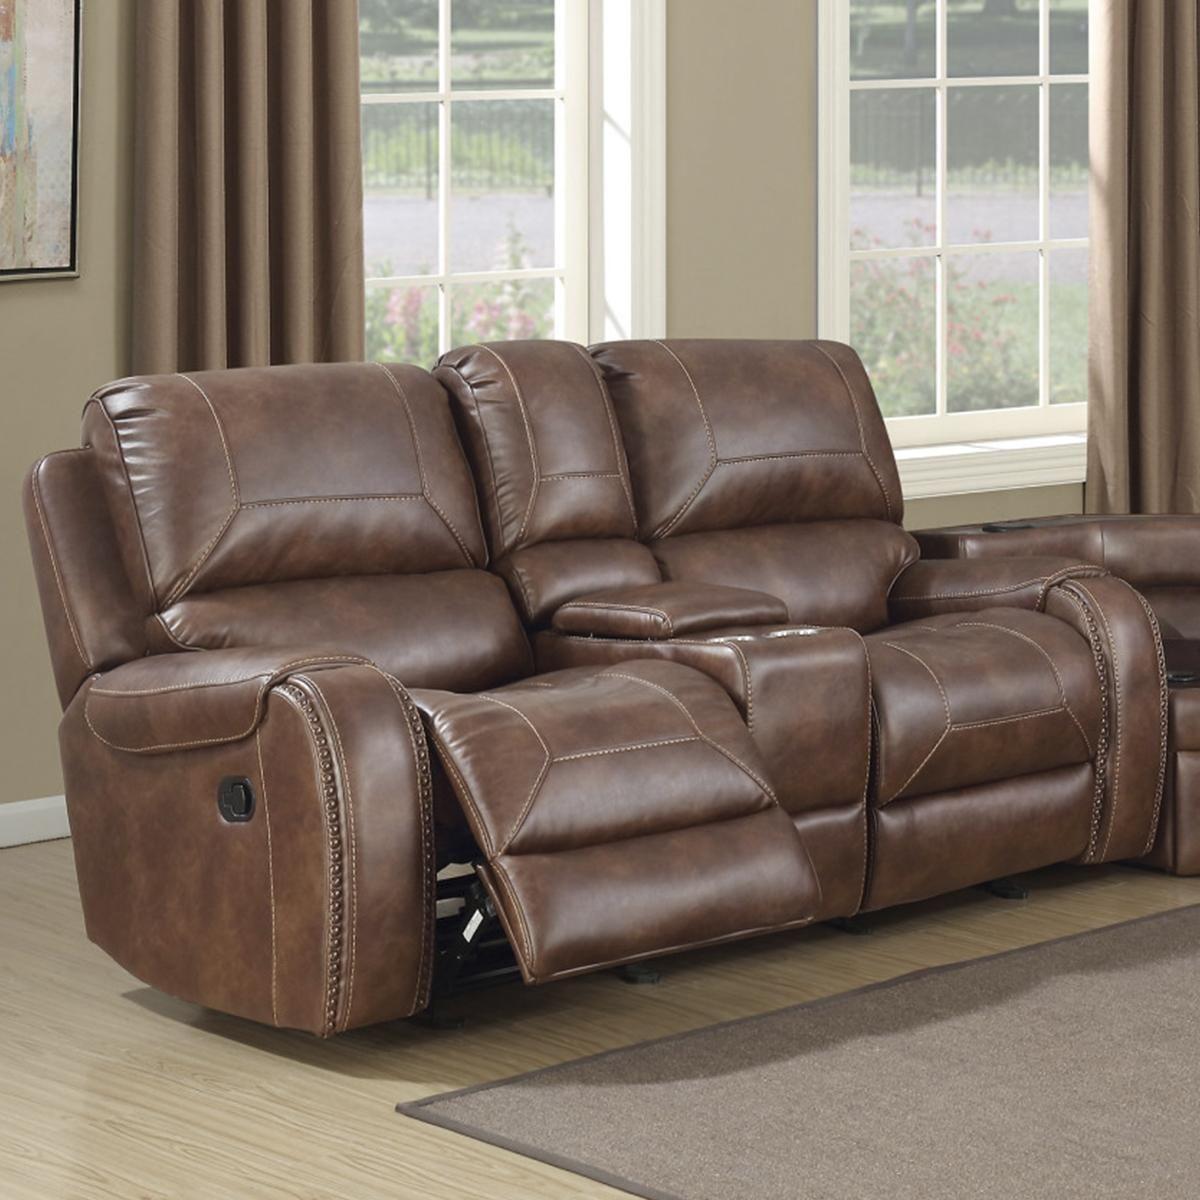 Product Main Image 0 Love Seat Furniture Loveseat Living Room